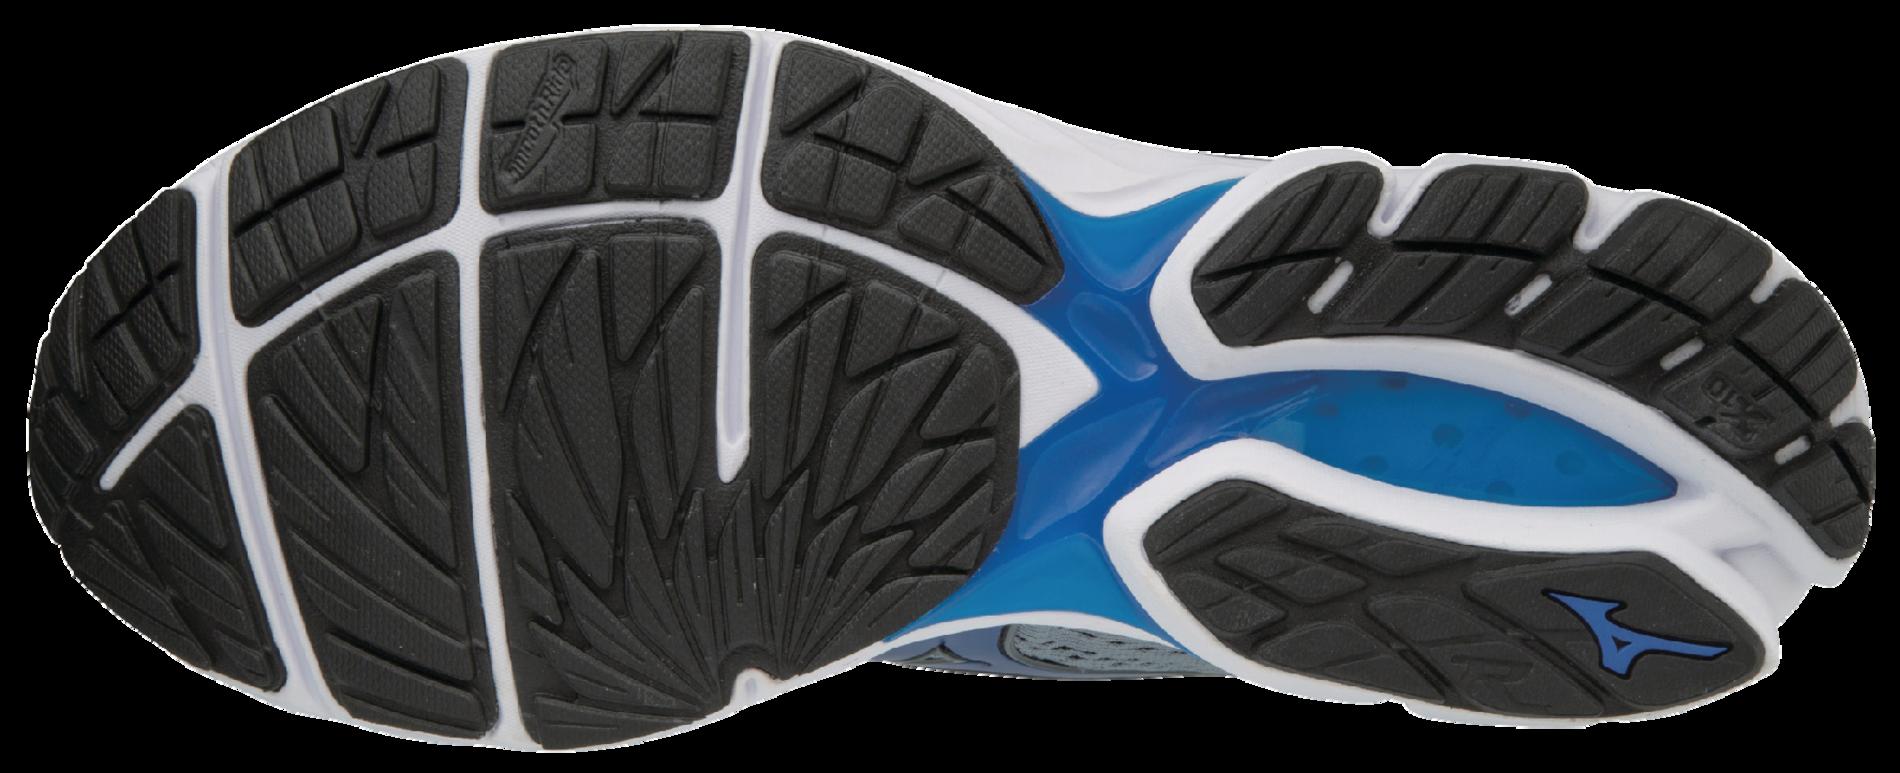 zapatillas mizuno wave rider 22 ultra max